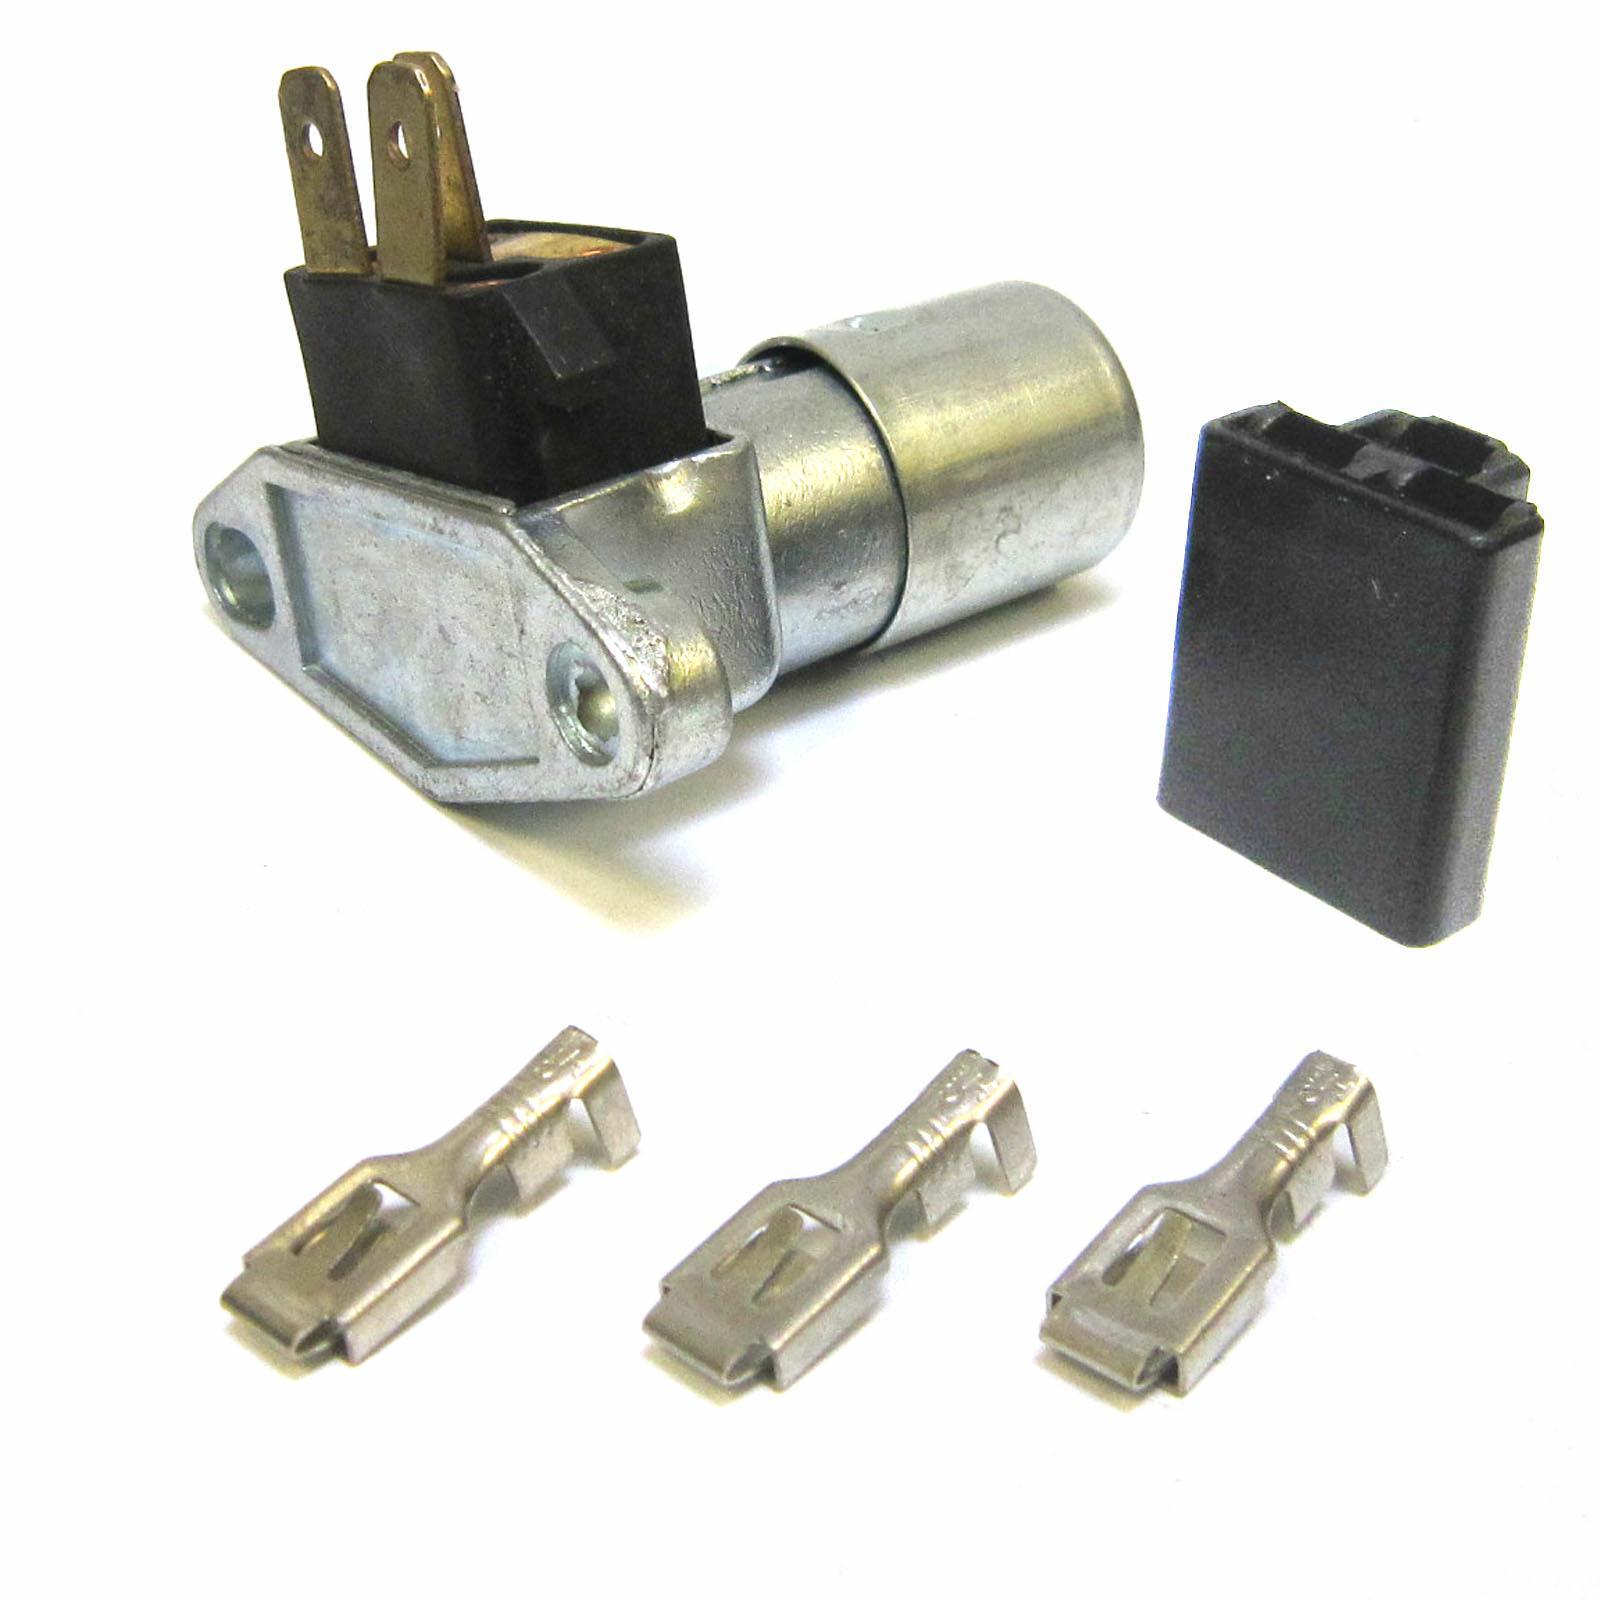 gm floor mount headlight dimmer switch w/ new socket ... floor dimmer switch wiring gm floor headlight dimmer switch wiring diagram #6